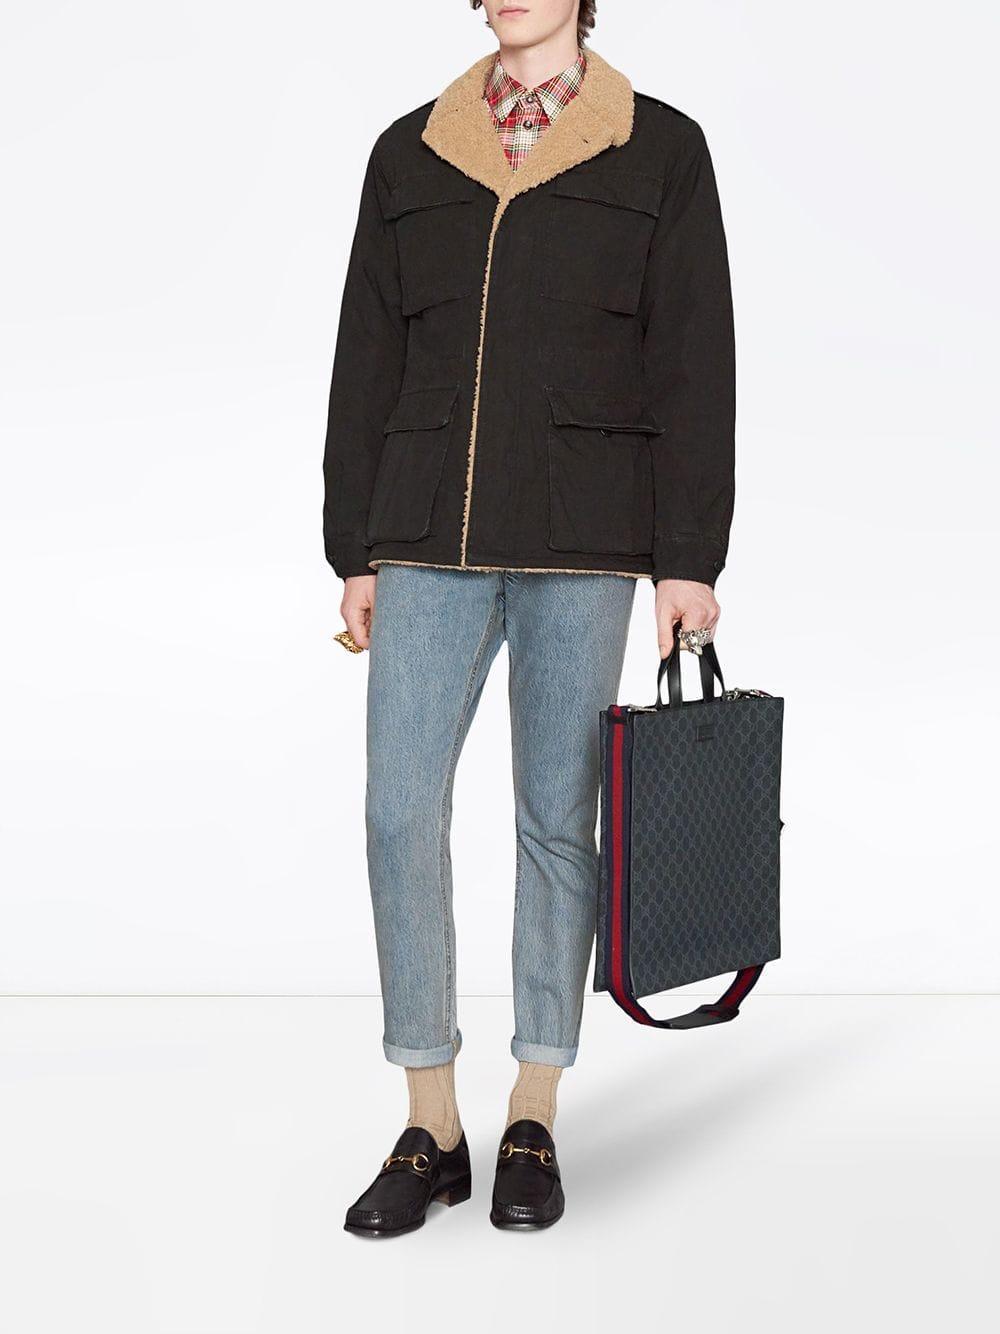 c26c8ff7bd0bc0 Lyst - Gucci GG Supreme Tote Bag in Black for Men - Save 14.806201550387598%